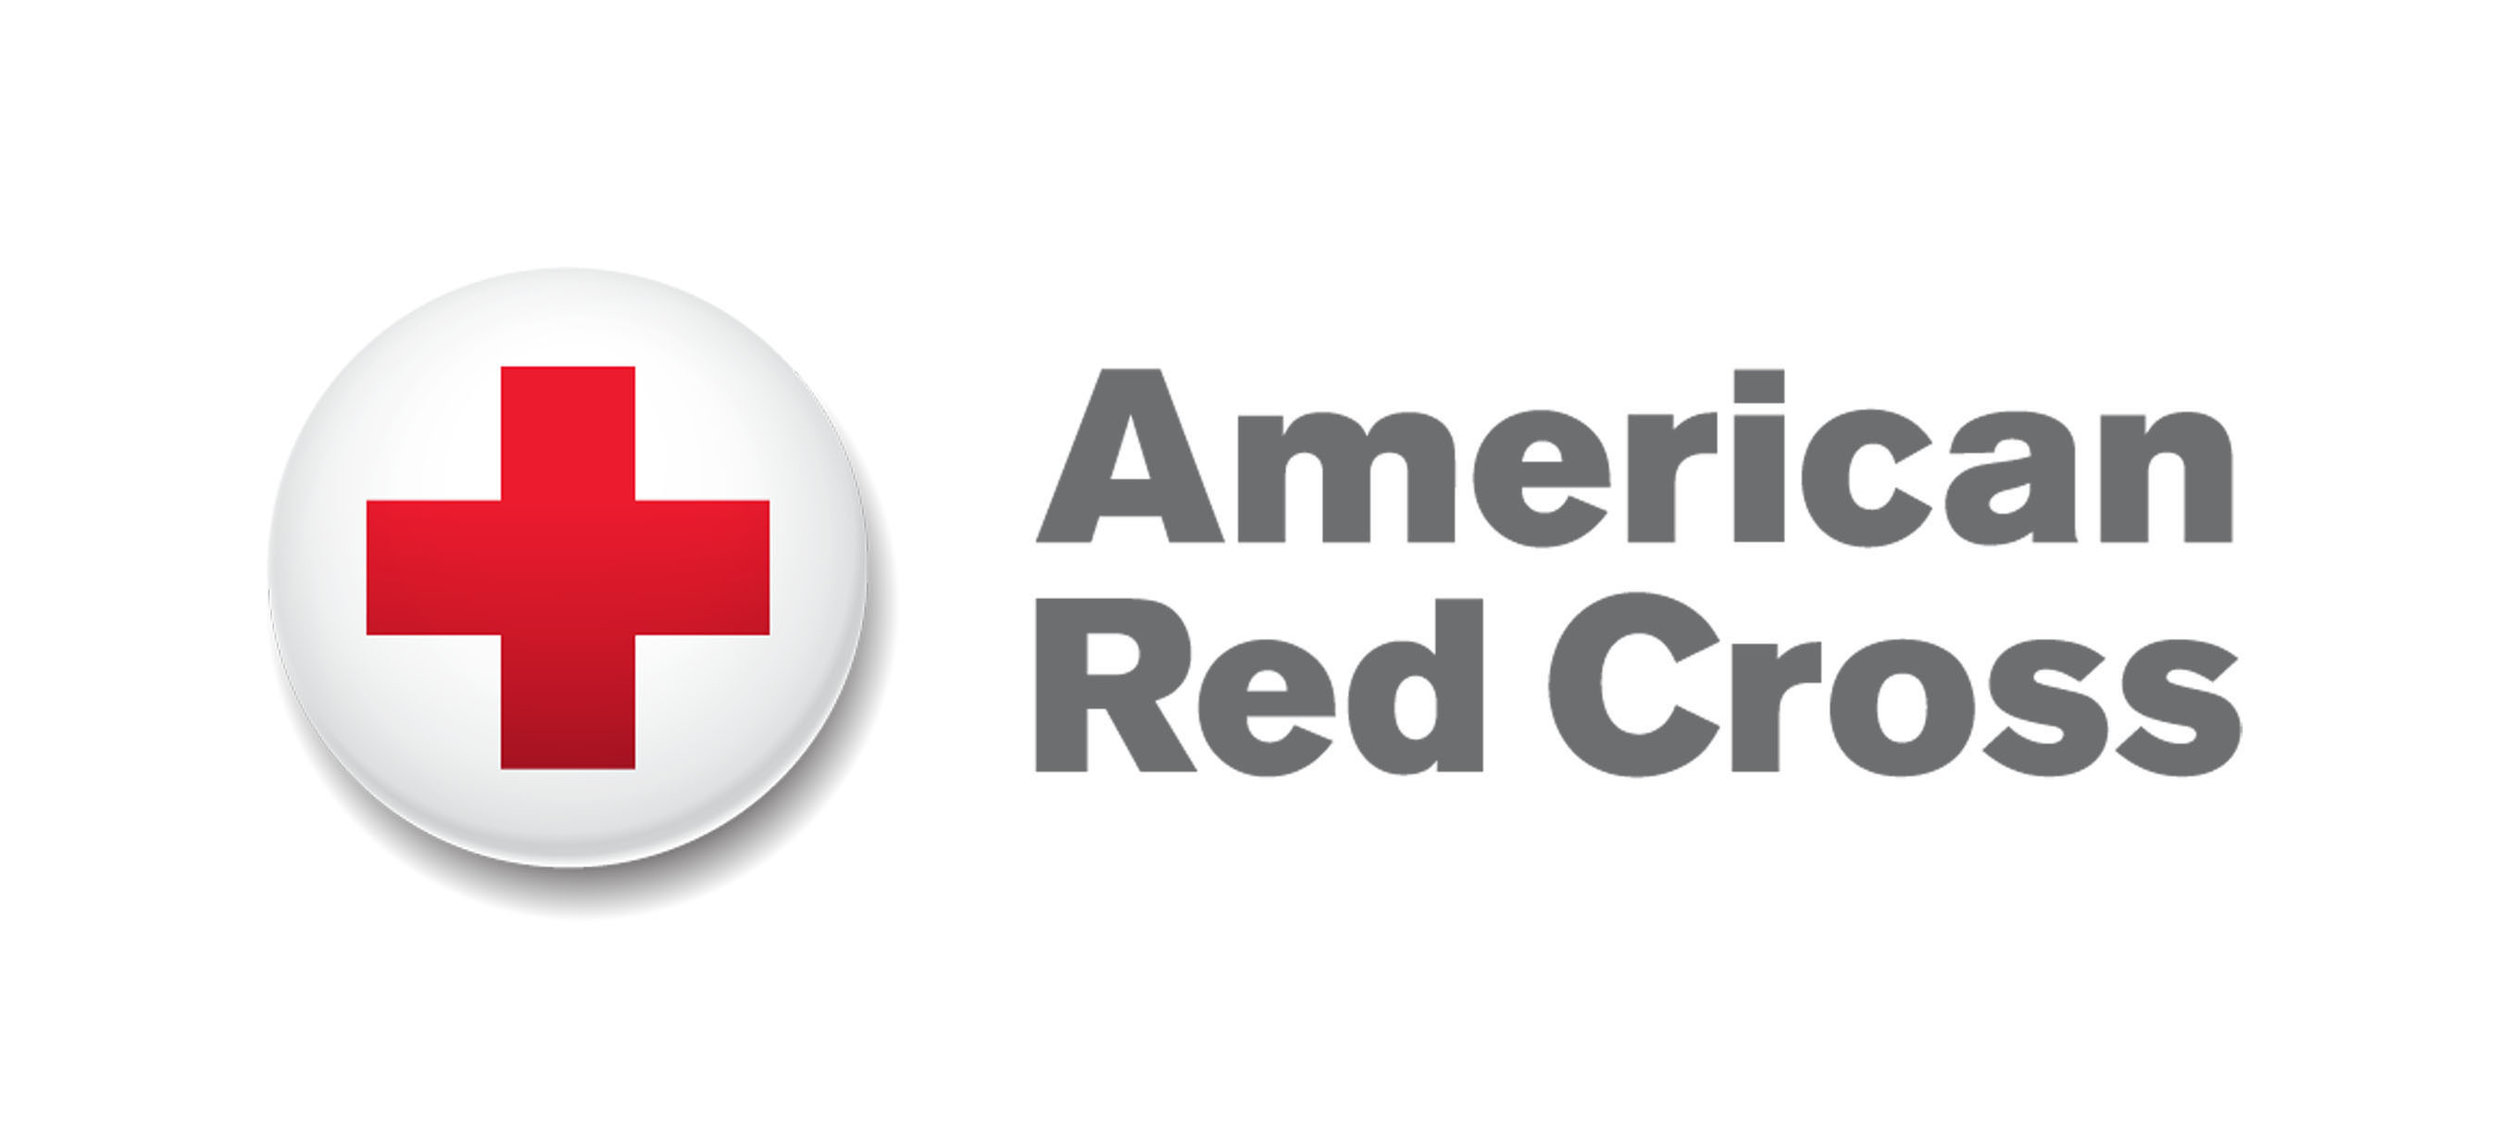 prn-american-red-cross-logo2812-1y-1-1-1high-11.jpg